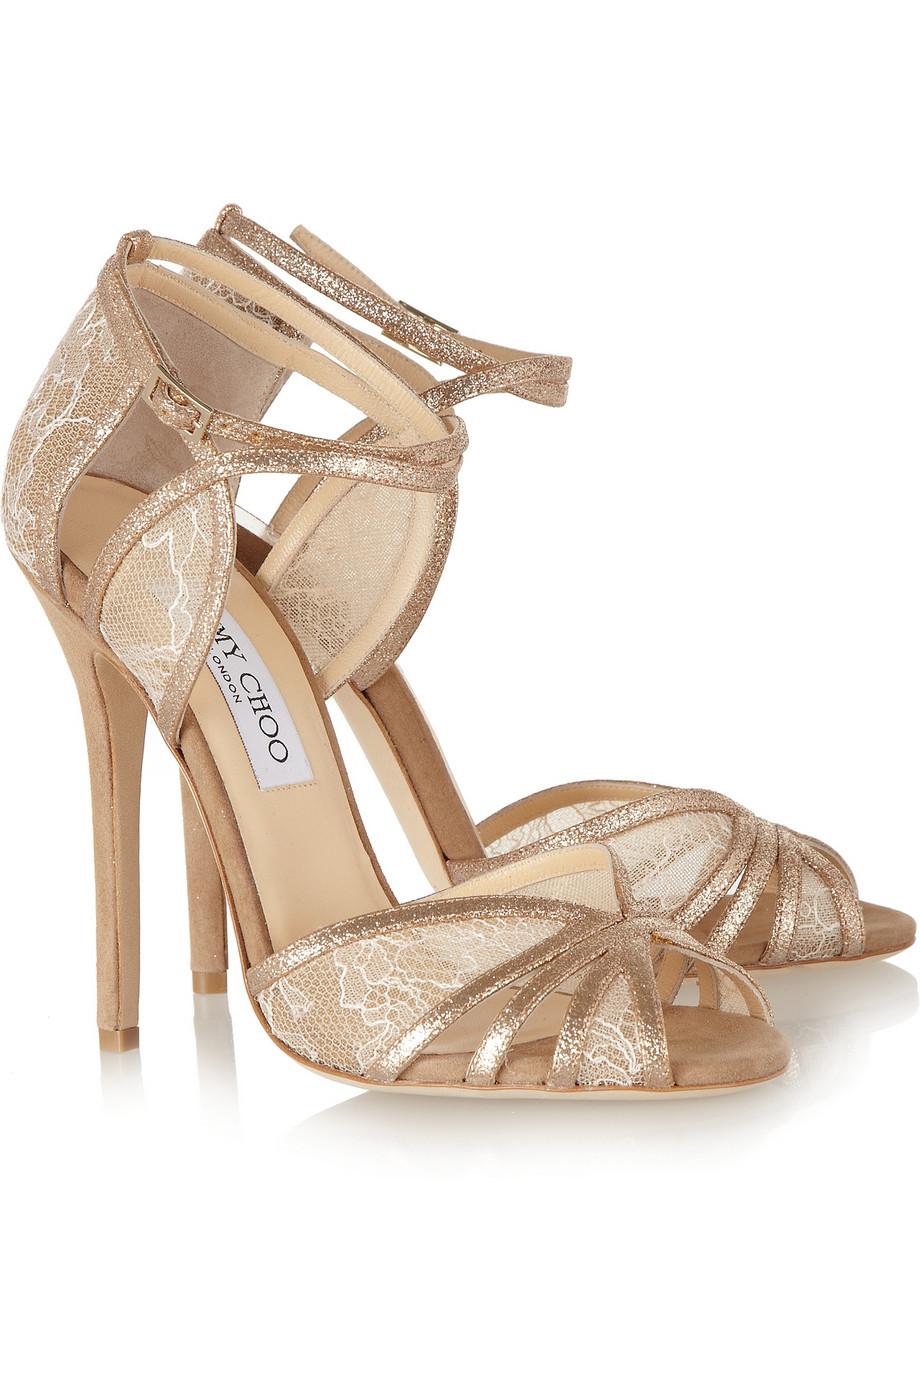 Copper Shoes Wedding 004 - Copper Shoes Wedding